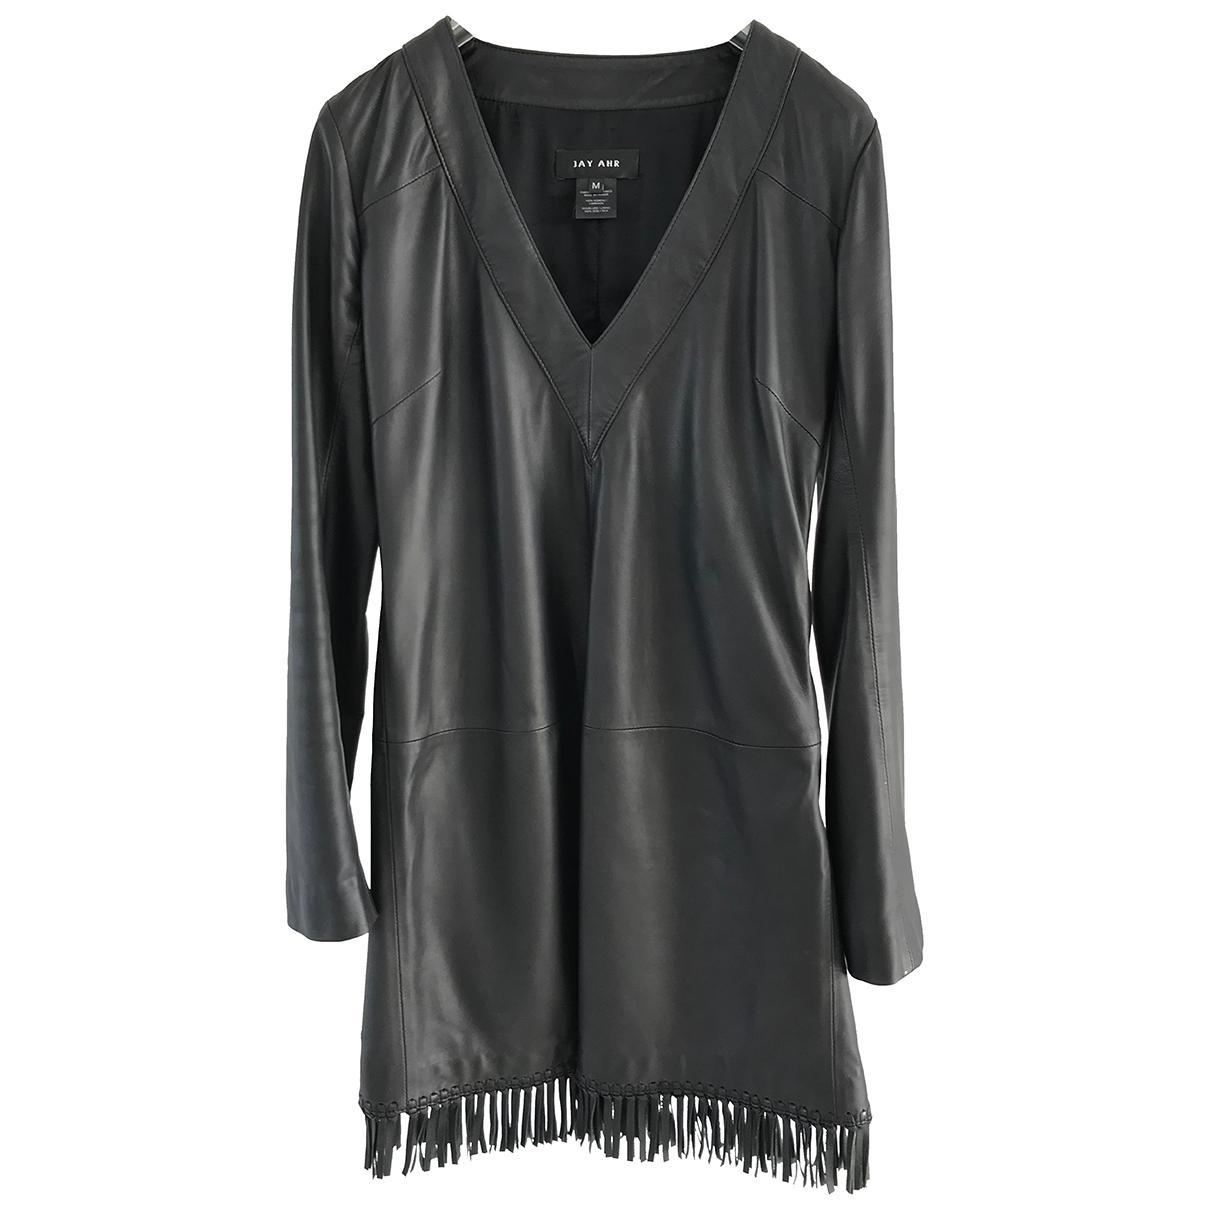 Jay Ahr \N Black Leather dress for Women M International